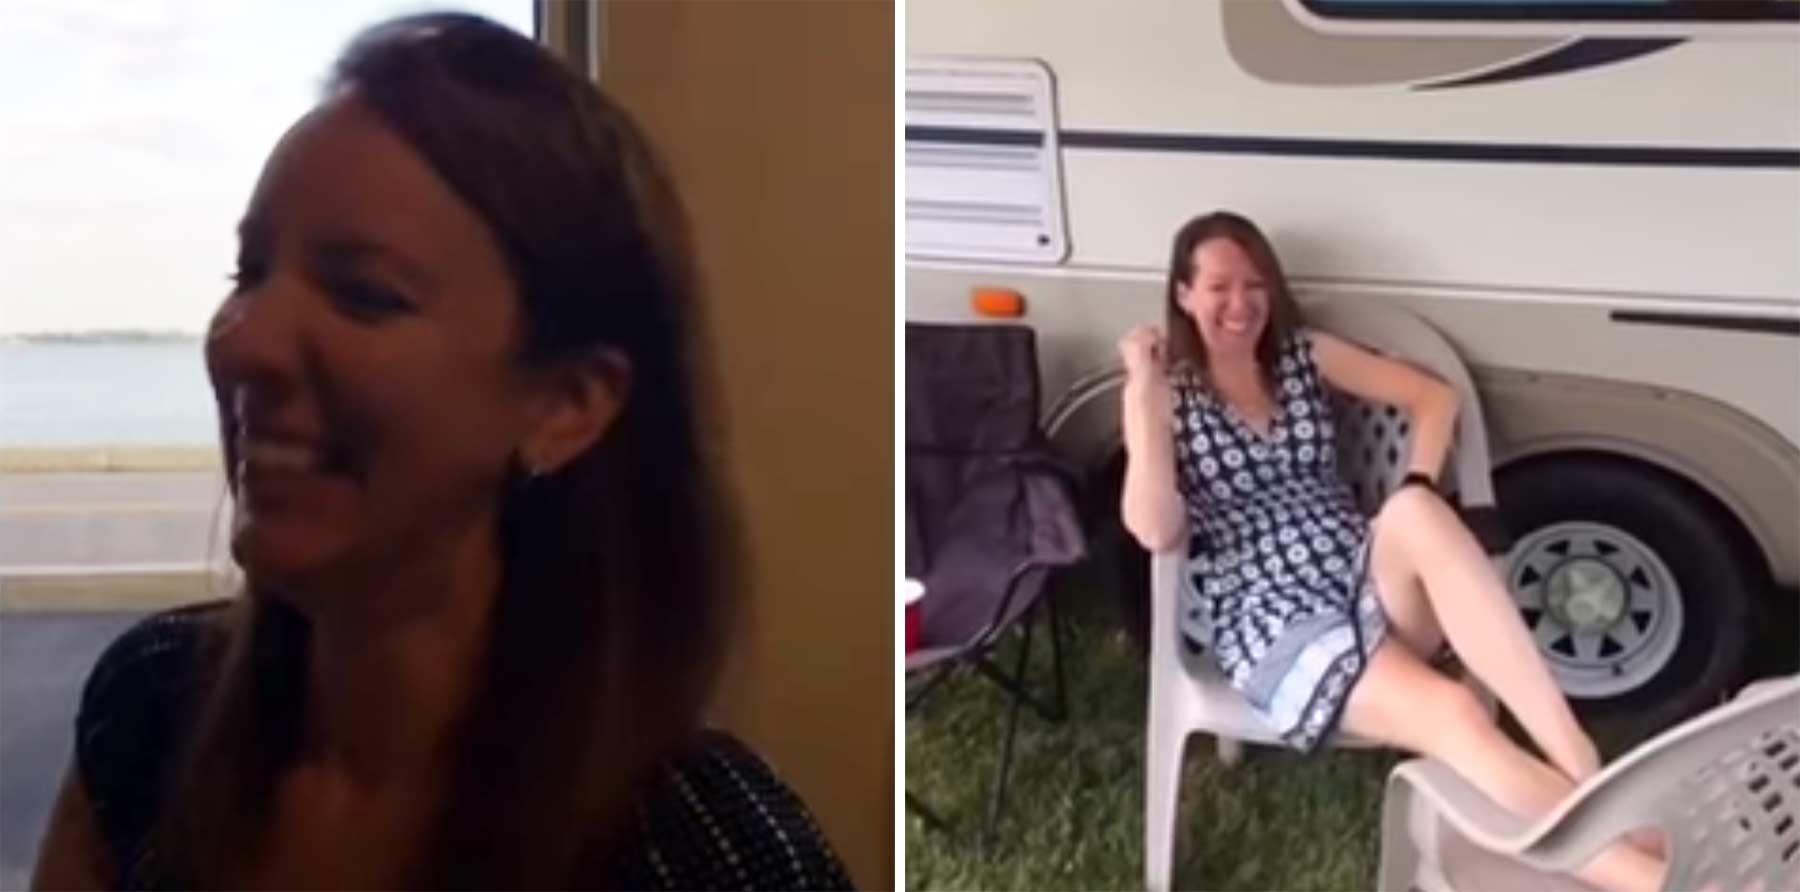 Herzallerliebst: Garys Snapchat-Oden an seine Frau garys-snaps-for-liz